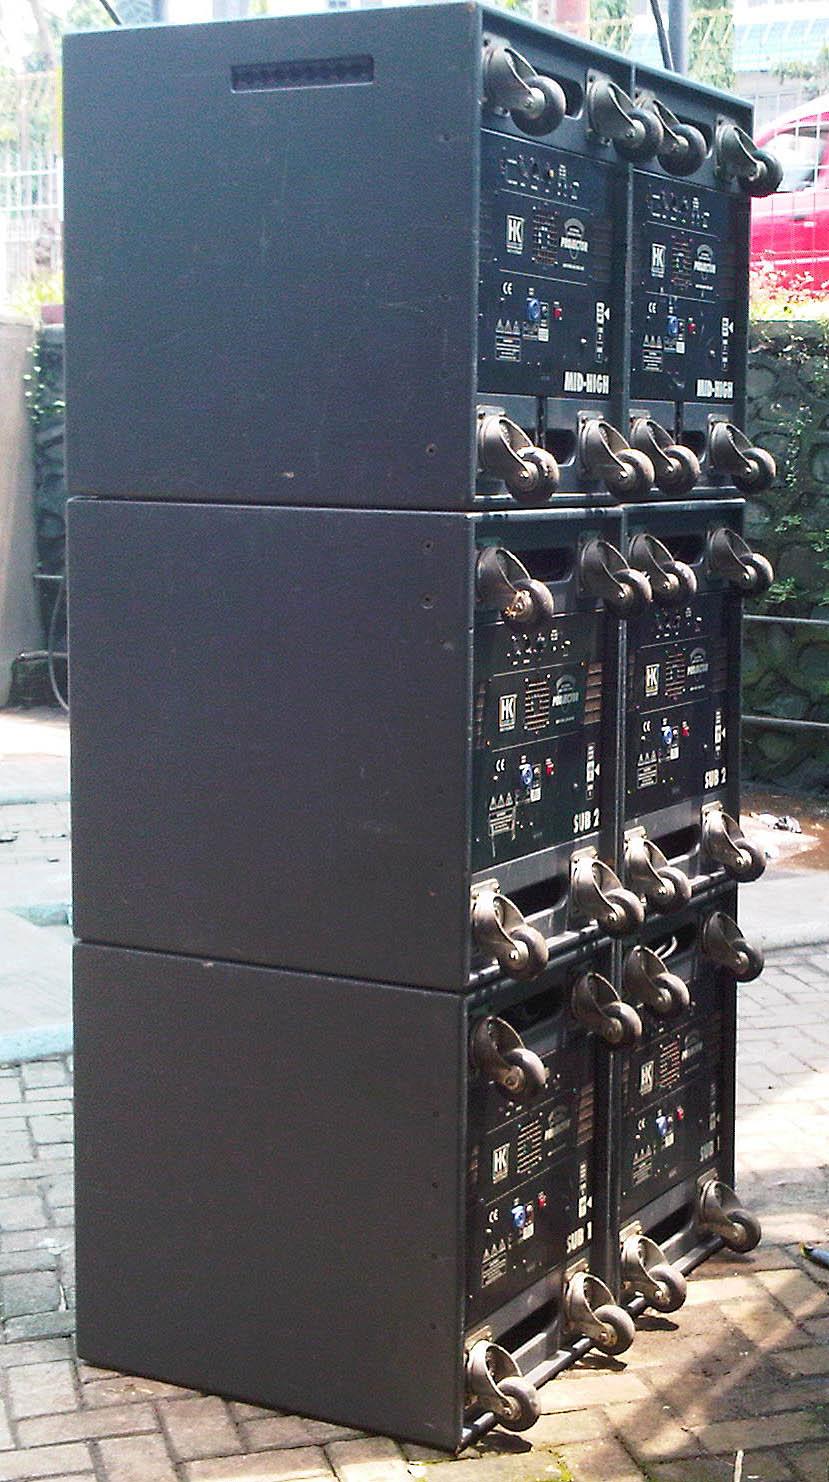 hk audio projector system image 534683 audiofanzine. Black Bedroom Furniture Sets. Home Design Ideas